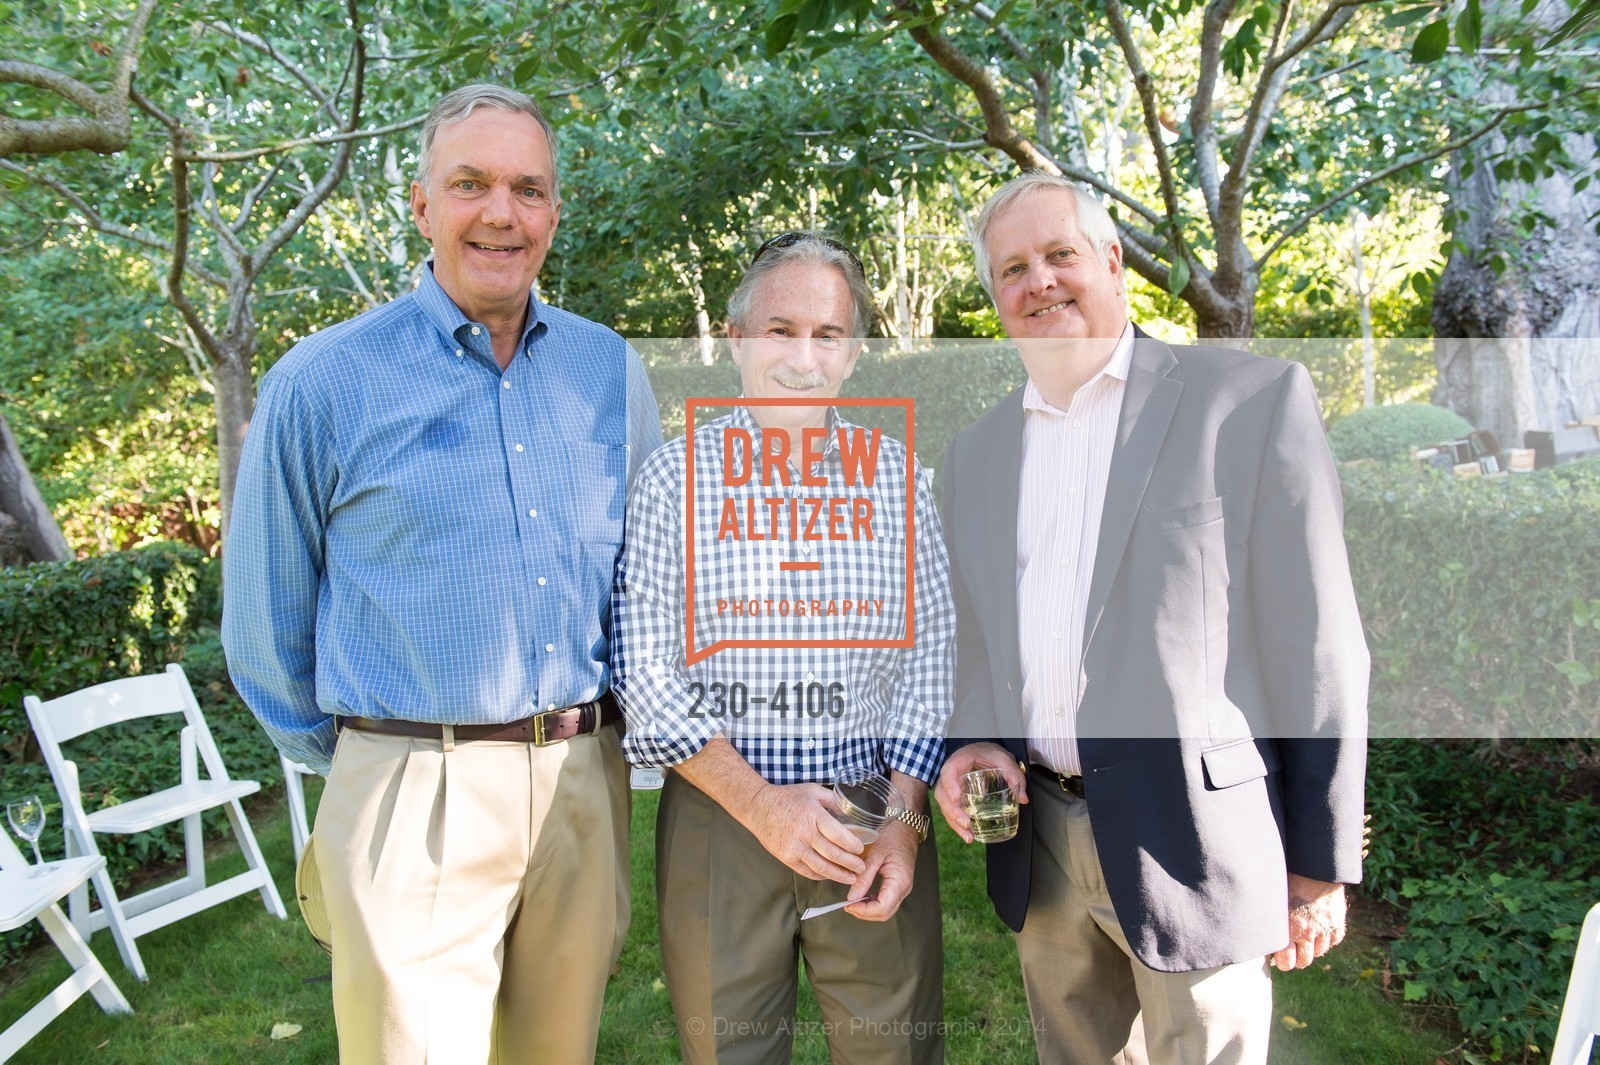 John Stevenson, Bill Last, Wade Aubry, Photo #230-4106